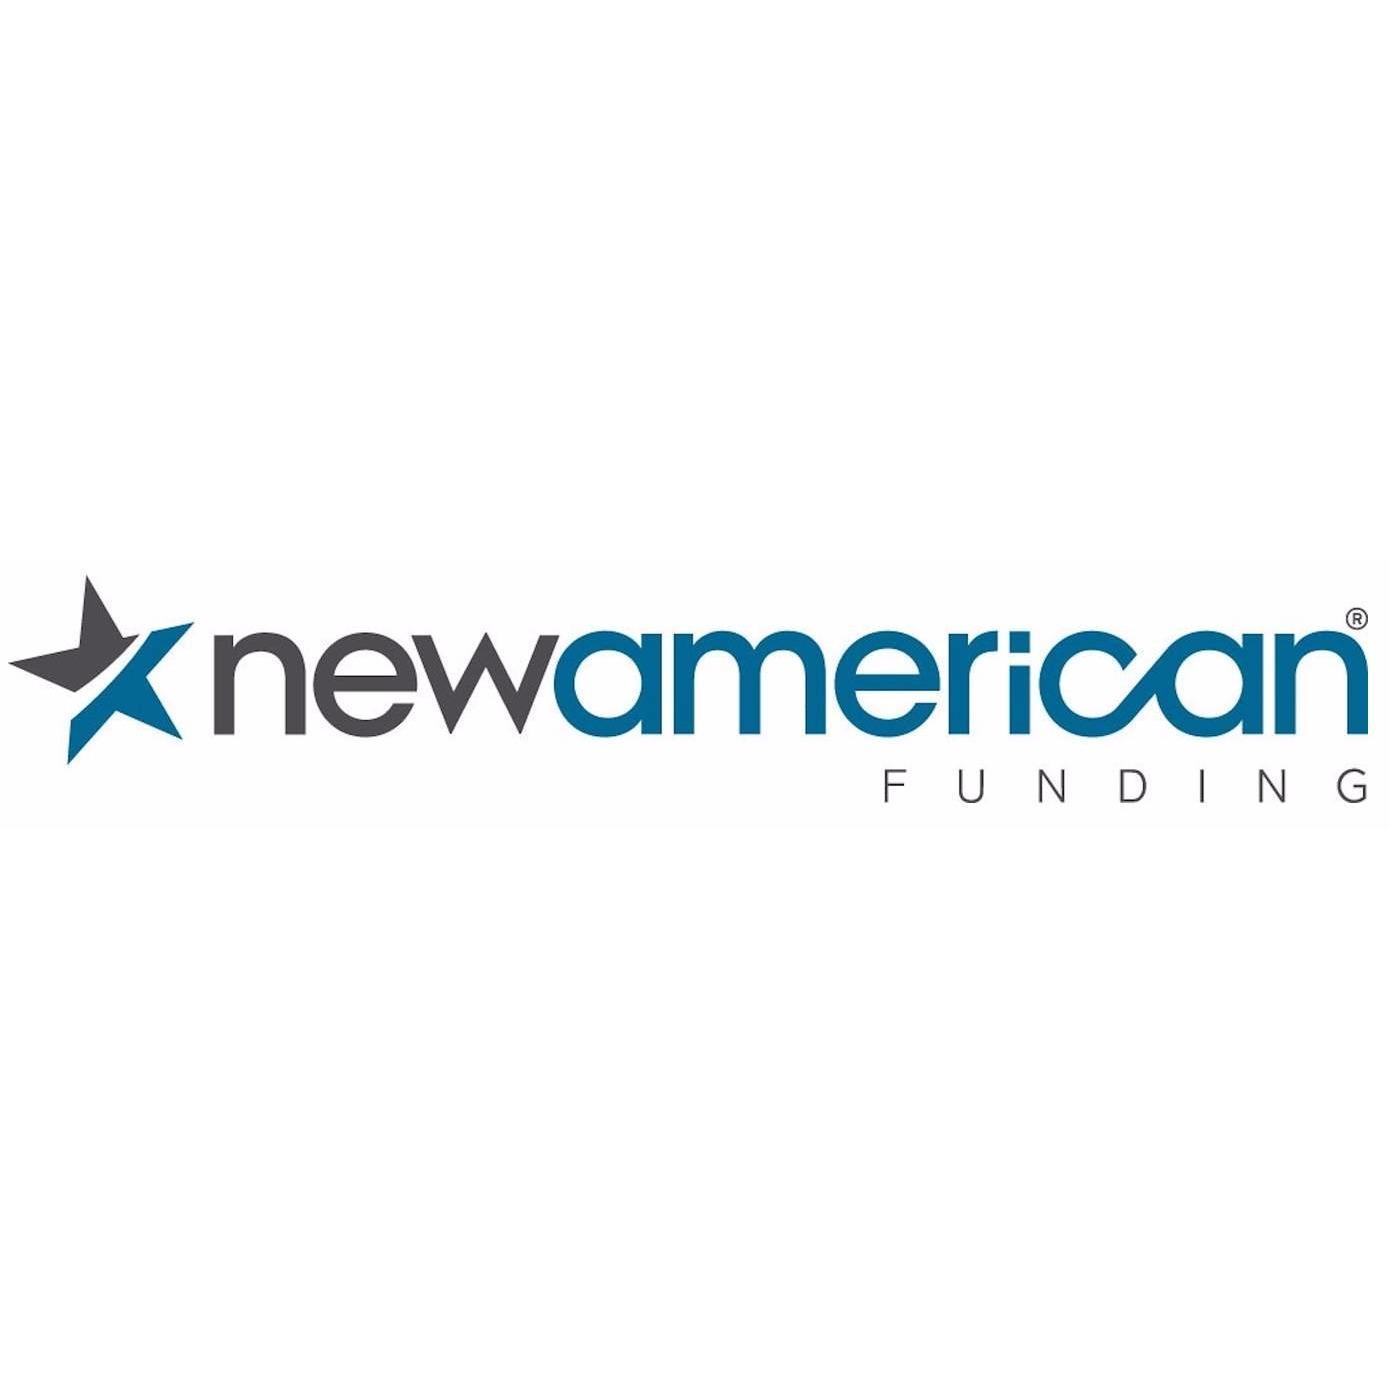 Jon Vance Home Loans - West Jordan, UT 84088 - (801)755-1054 | ShowMeLocal.com